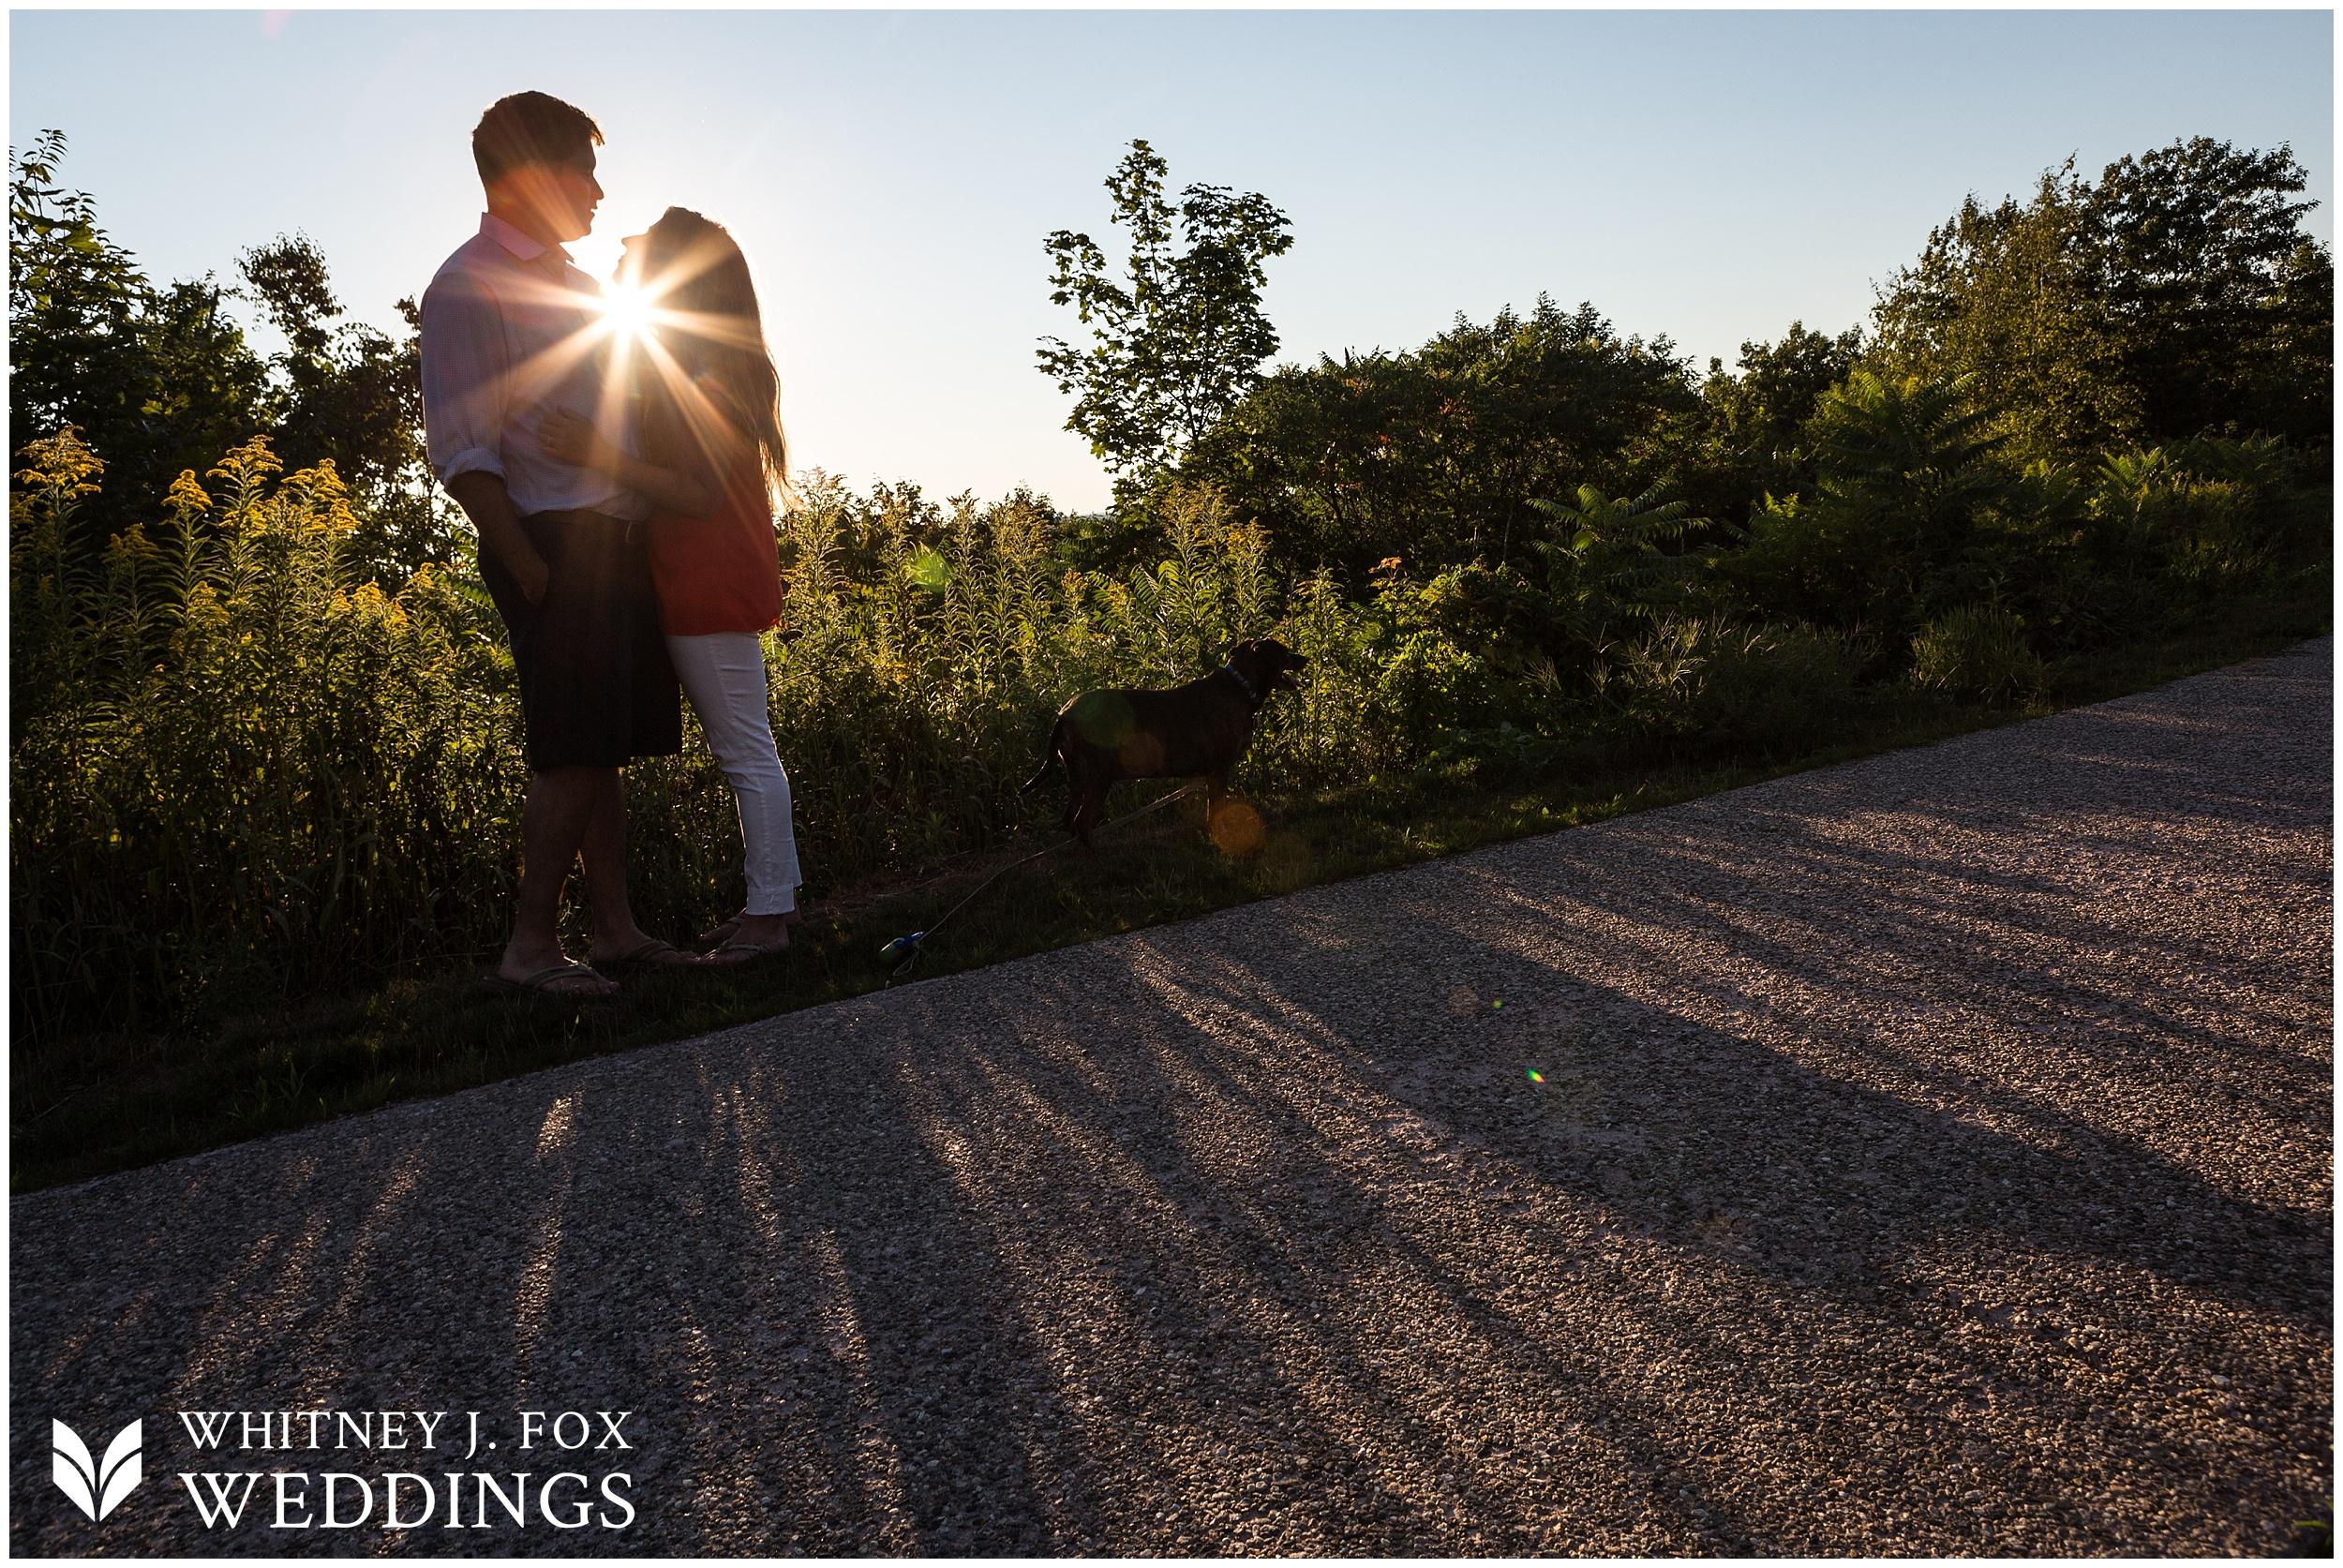 12_146_western_promenade_willard_beach_engagement_session_portland_maine_wedding_photographer_whitney_j_fox_1710.jpg